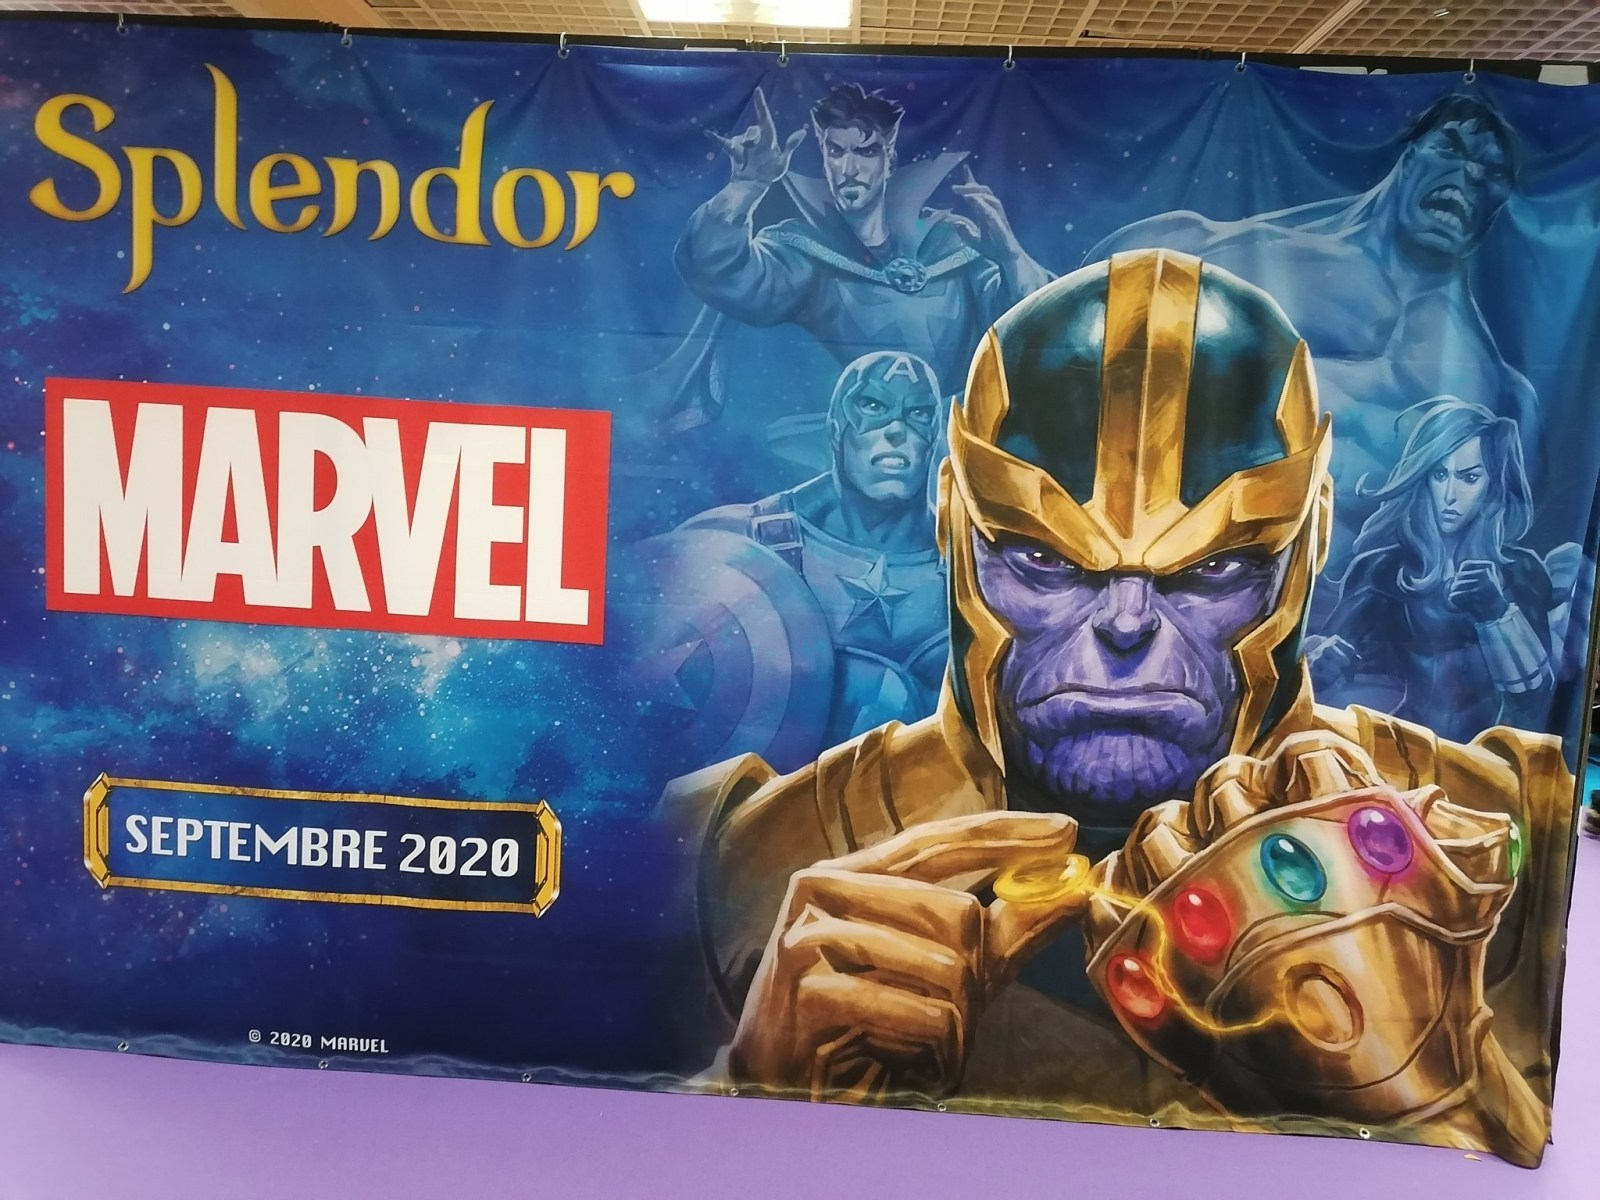 Teaser Banner de Splendor Marvel, no Festival de Jogos de Cannes